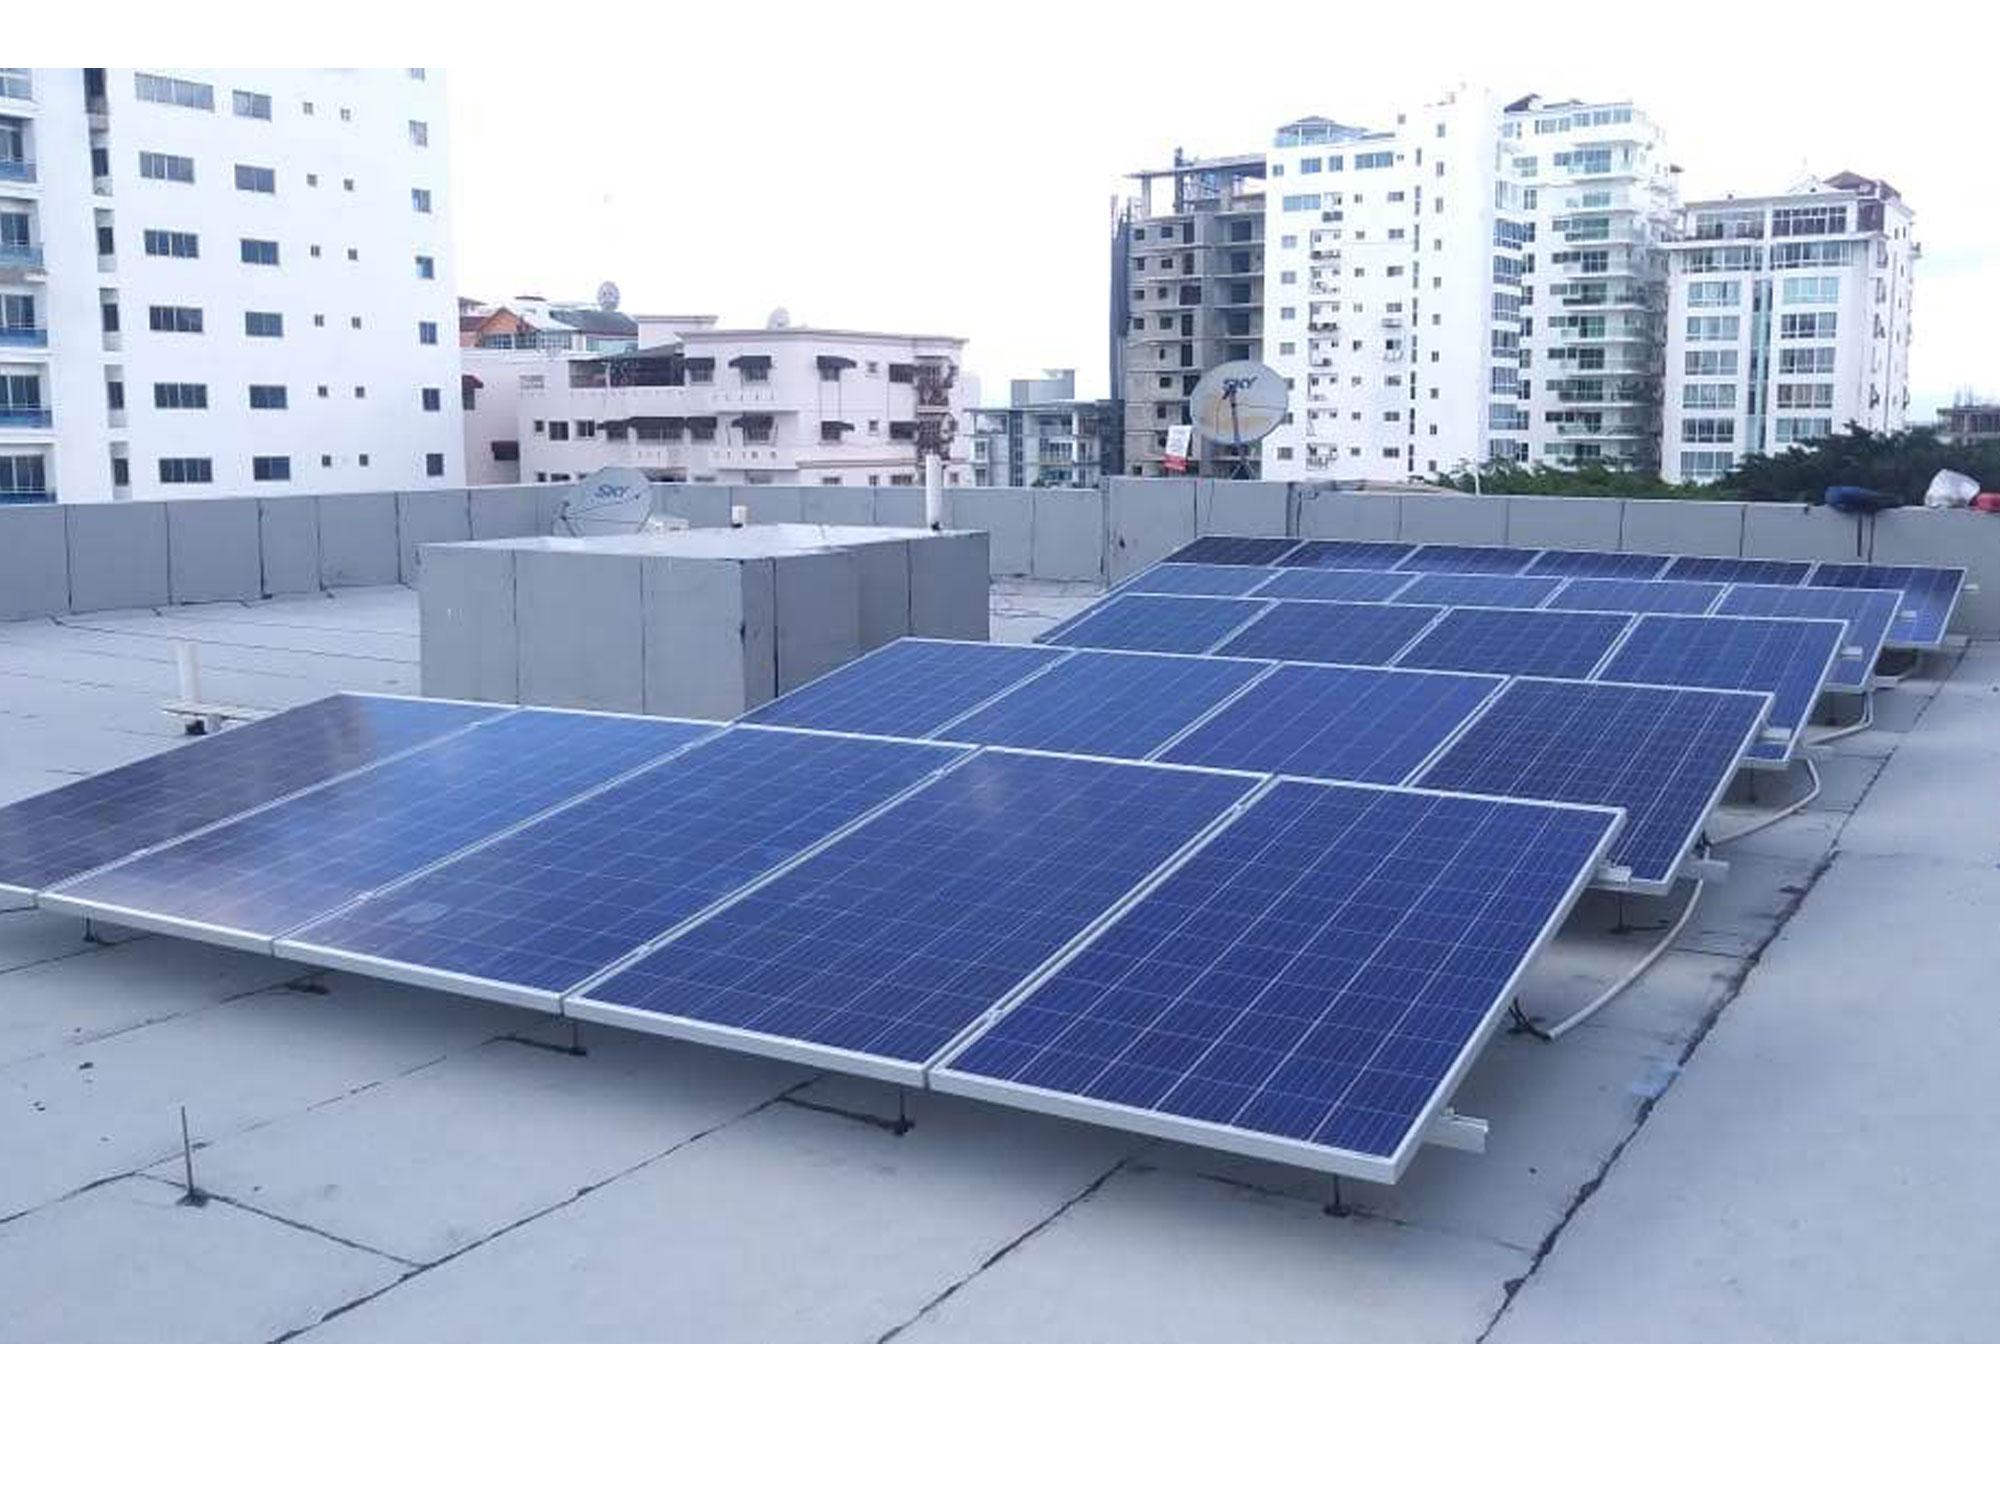 instalacion-solar-graciela-milan-republica-dominicana